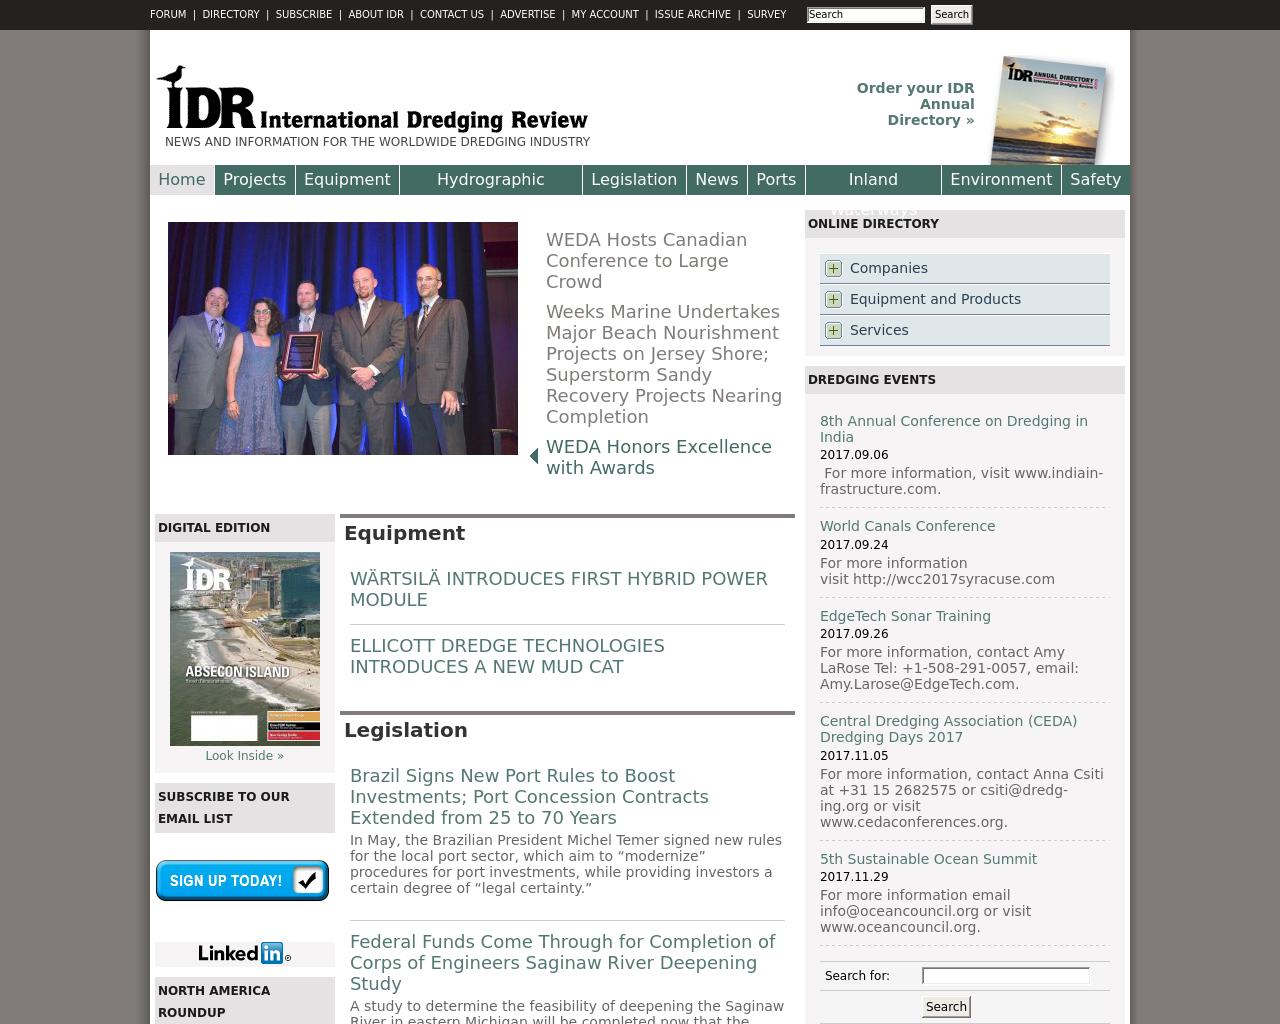 IDR-International-Dredging-Review-Advertising-Reviews-Pricing